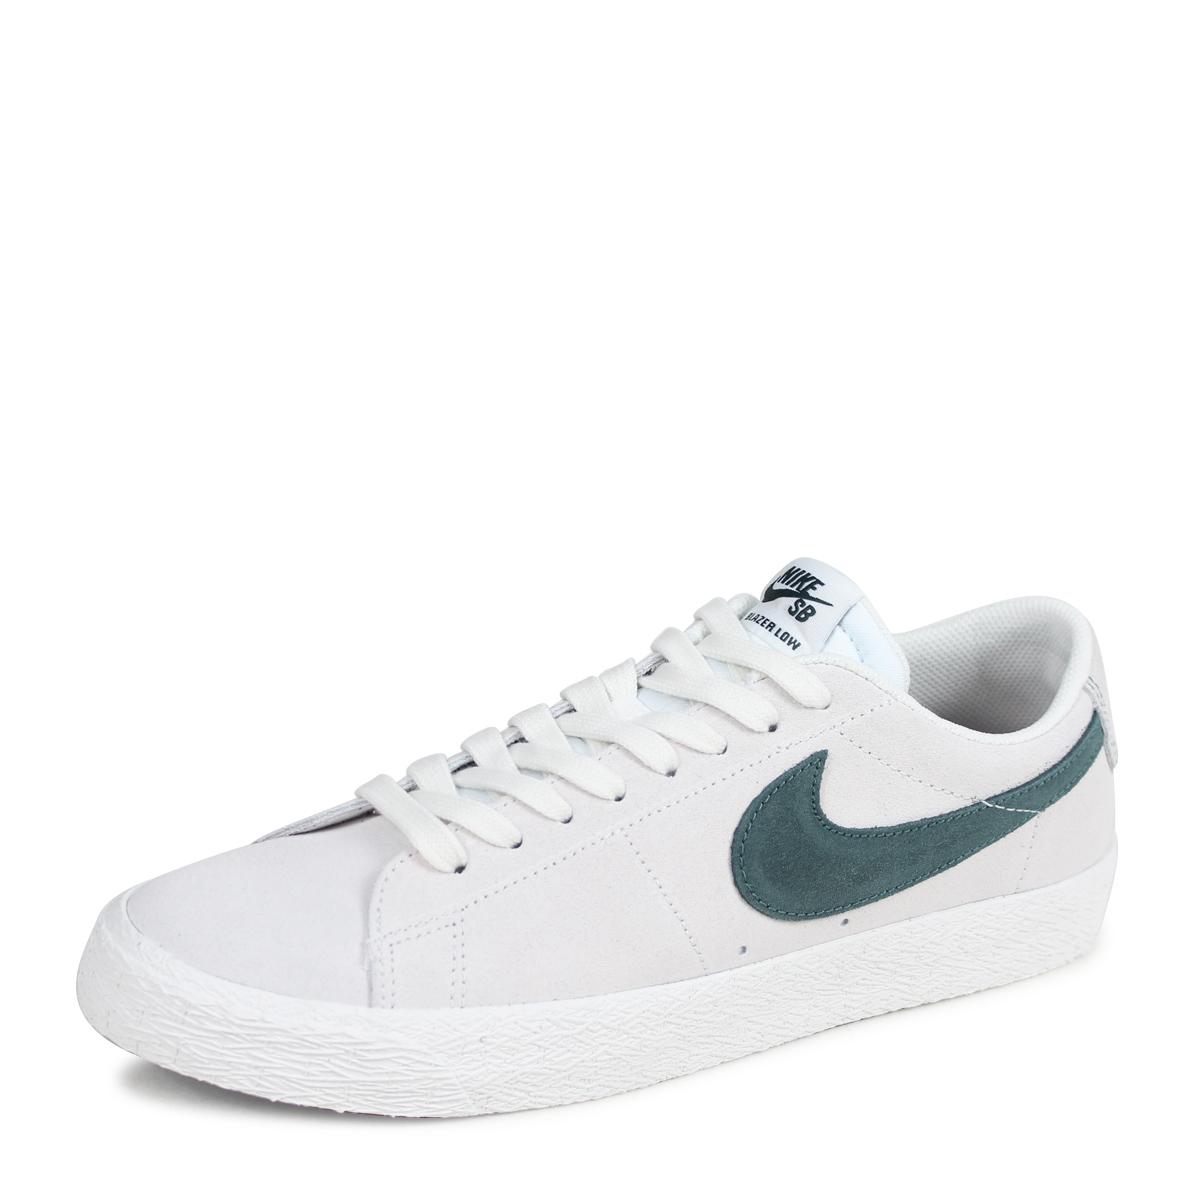 watch 0f5c1 6bcb0 ... NIKE BLAZER ZOOM LOW Nike SB blazer low sneakers men 864,347-101 off- white ...